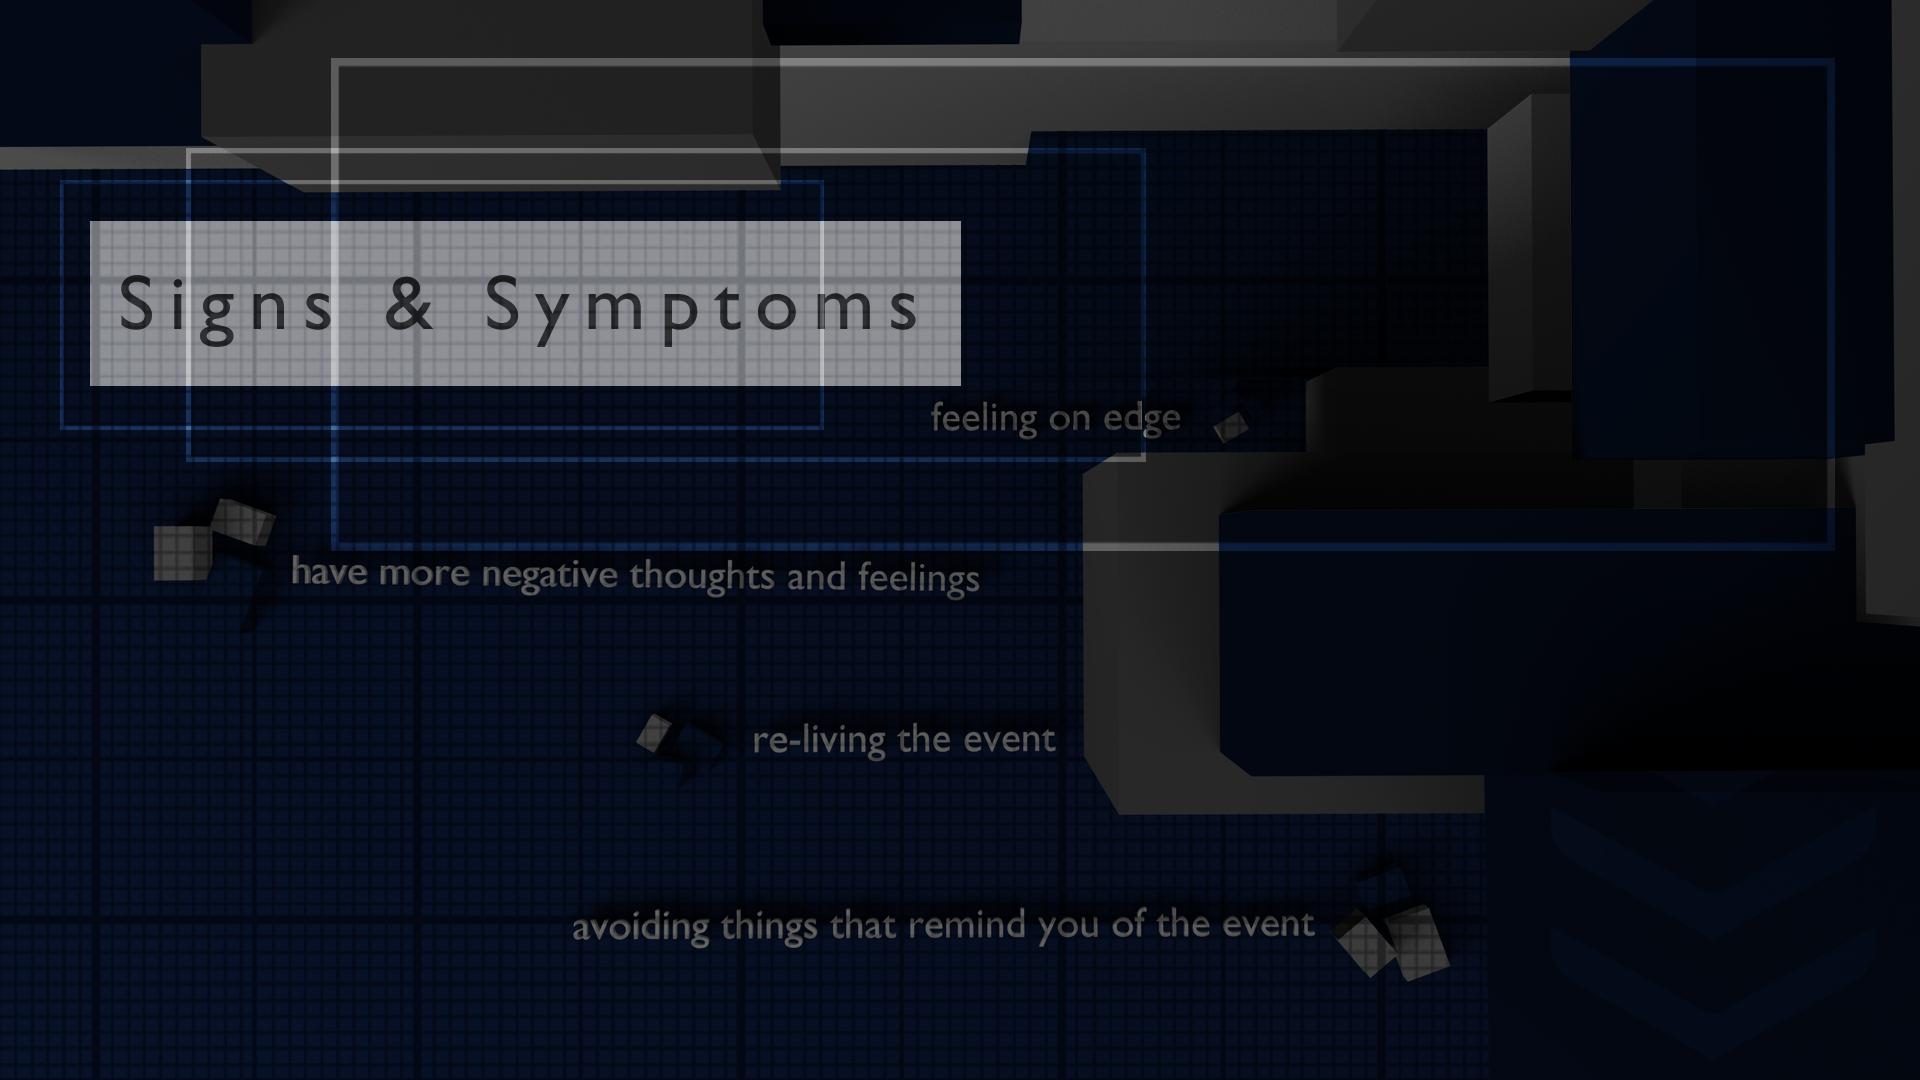 04_Signsymptoms.png